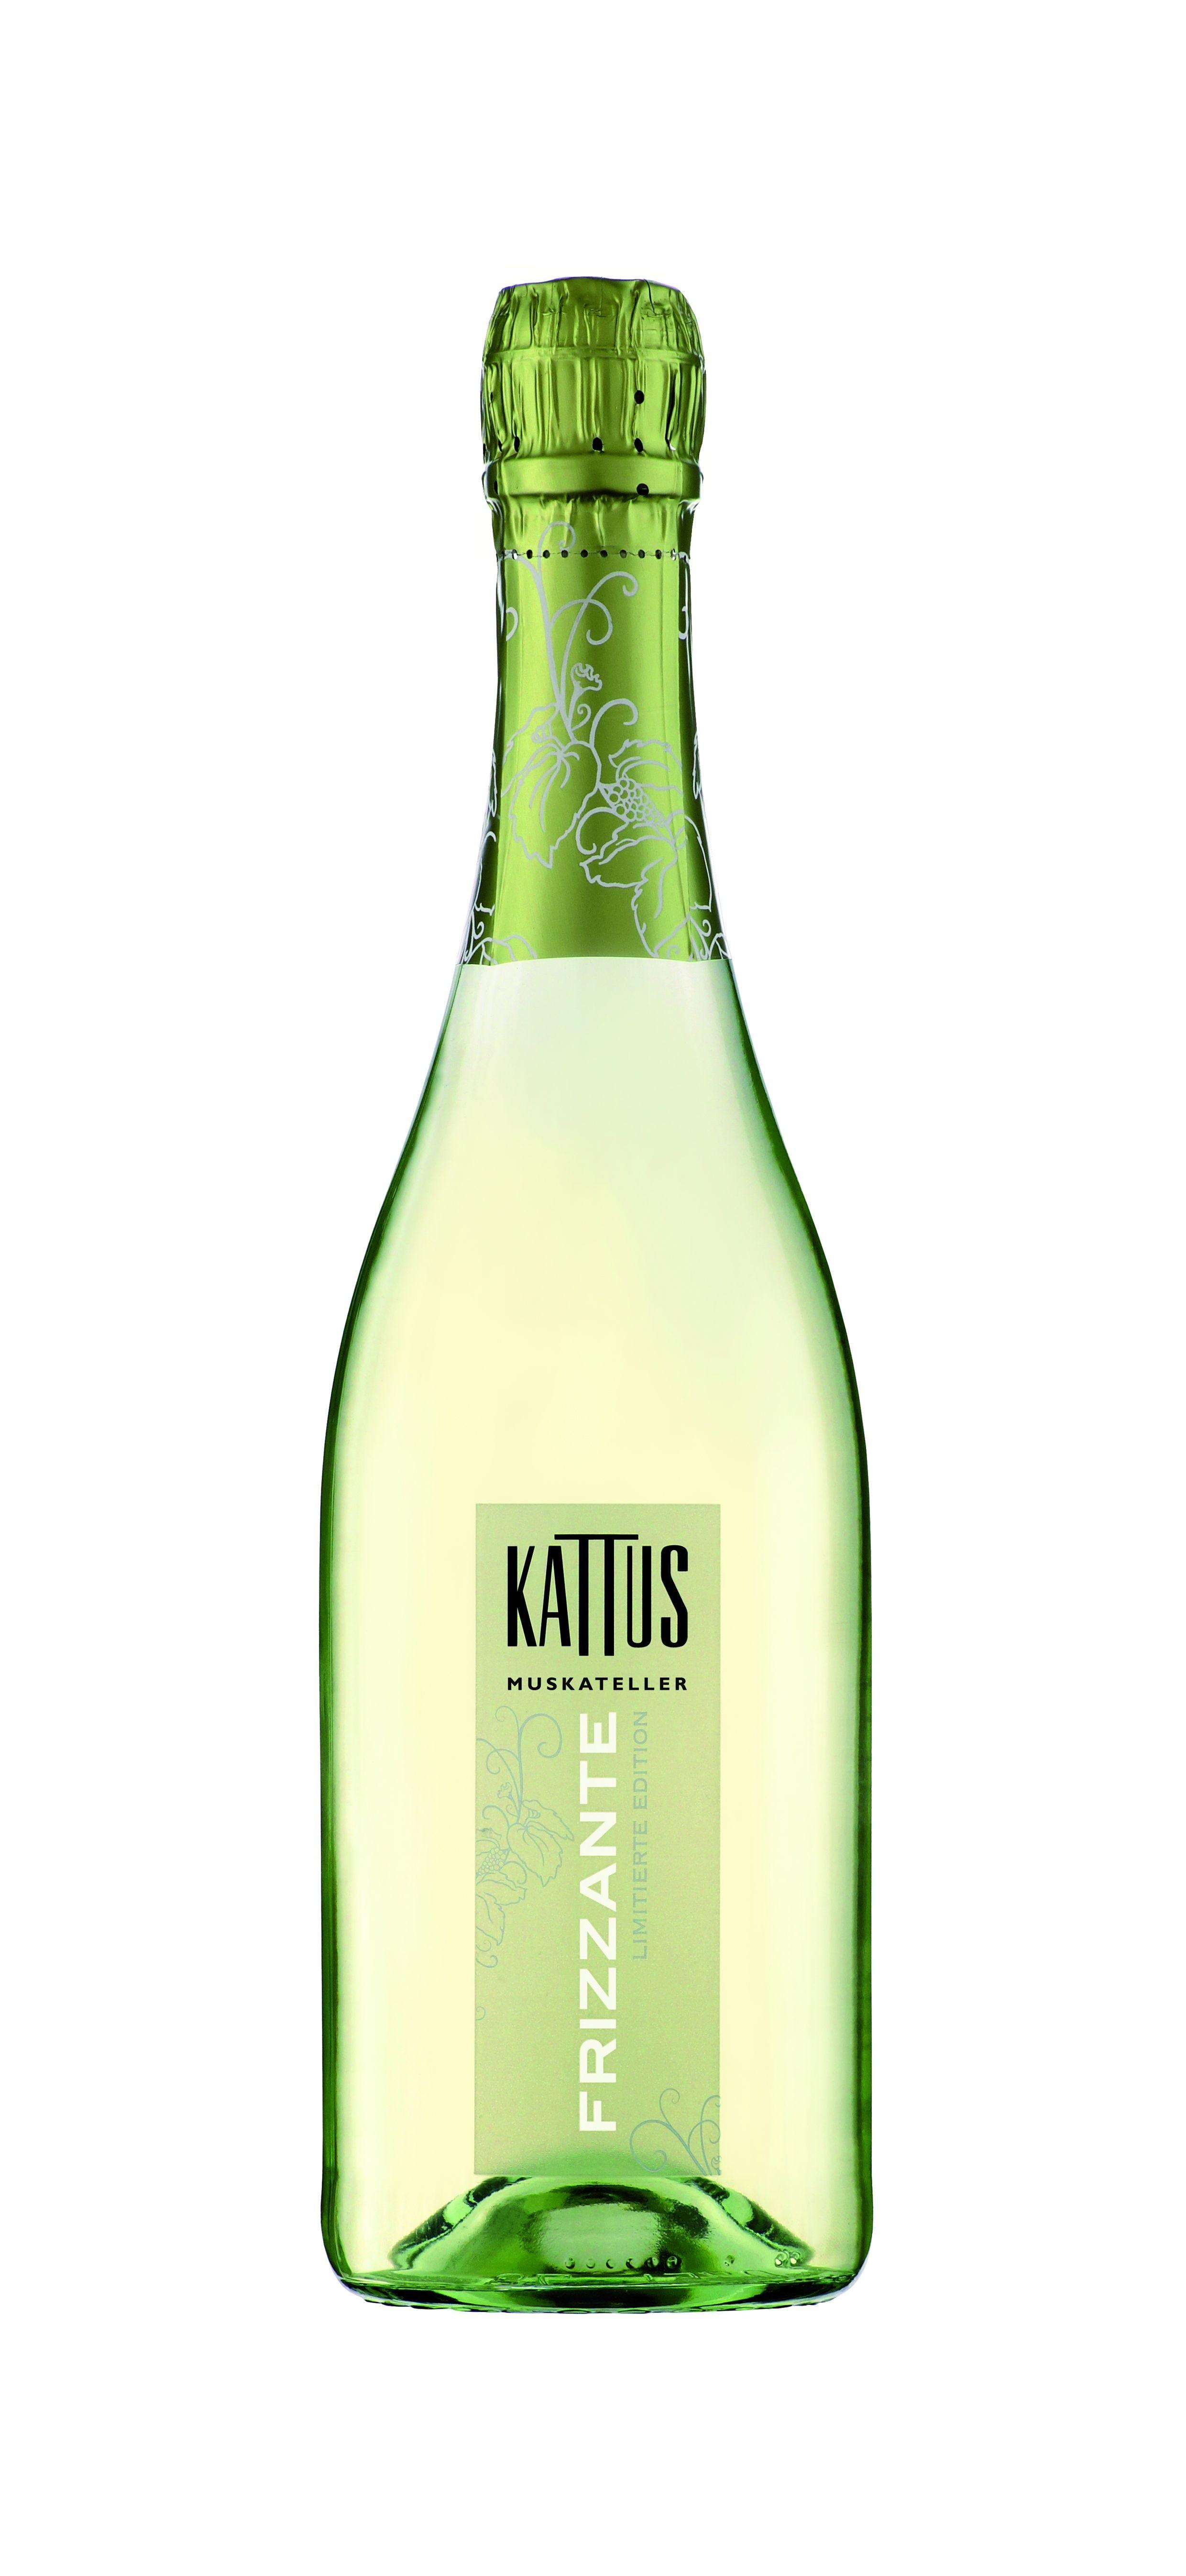 Kattus - FrizzanteMuskateller